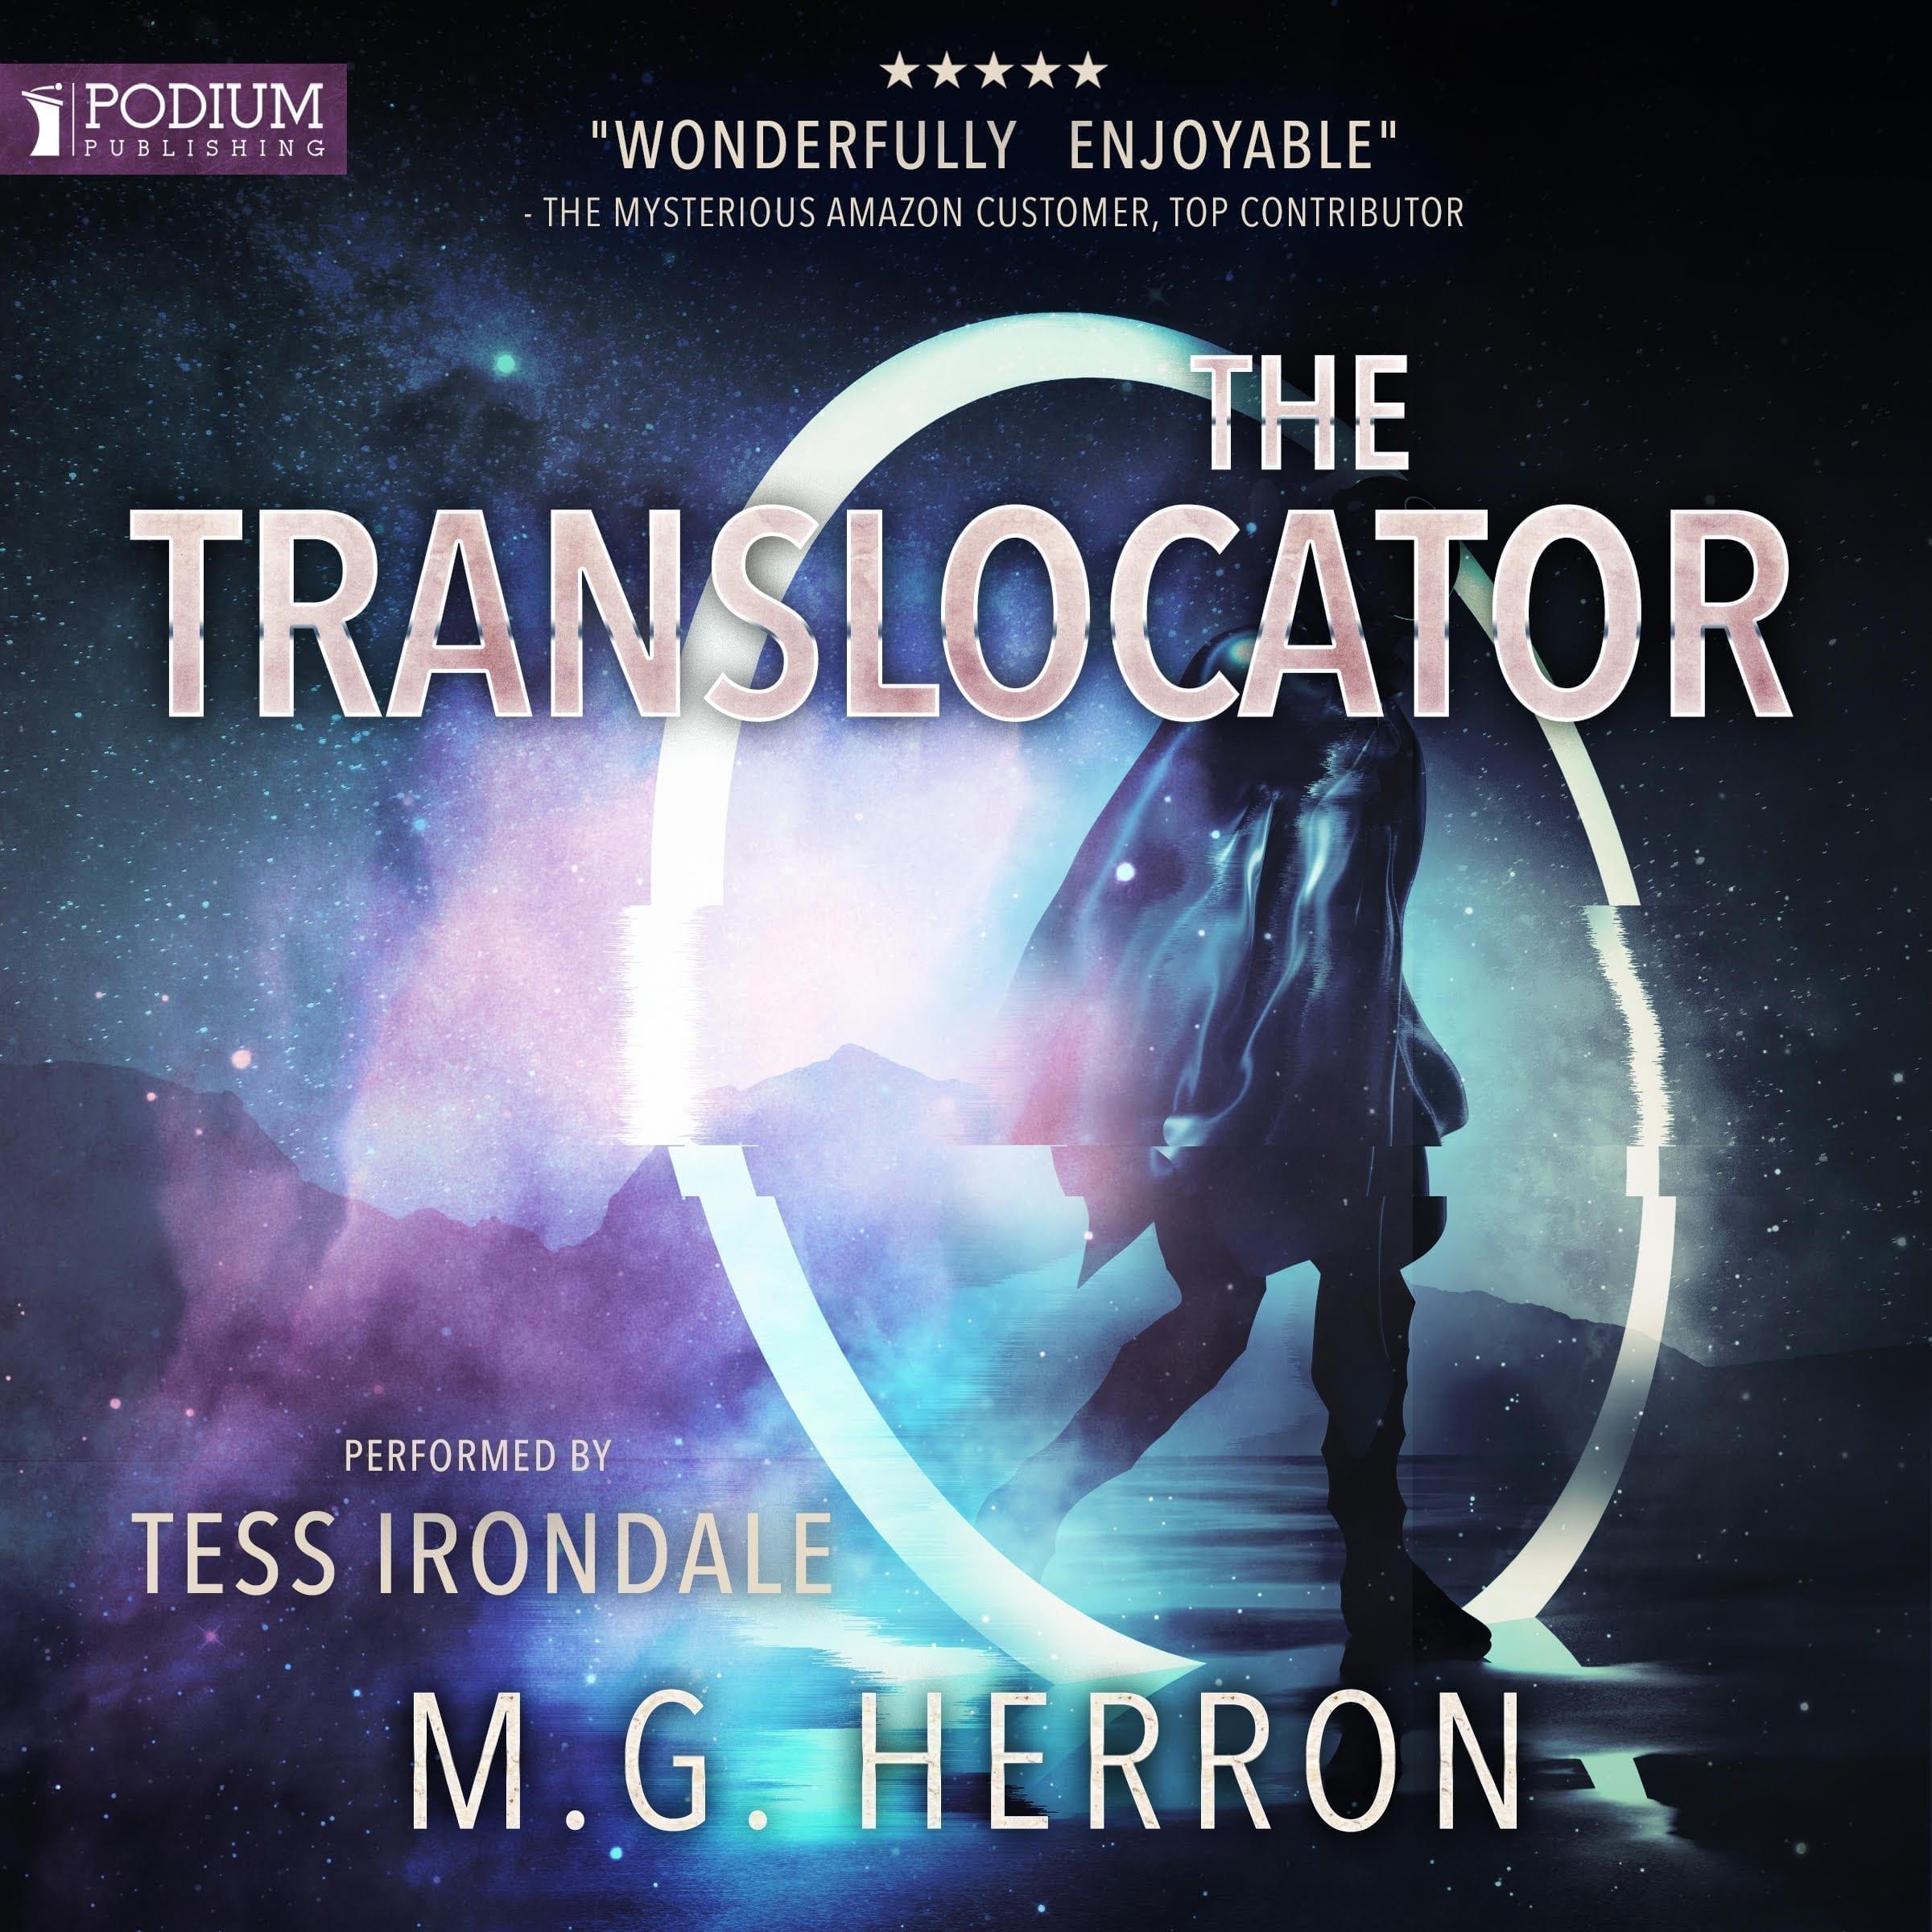 The Translocator (science fiction audiobook)